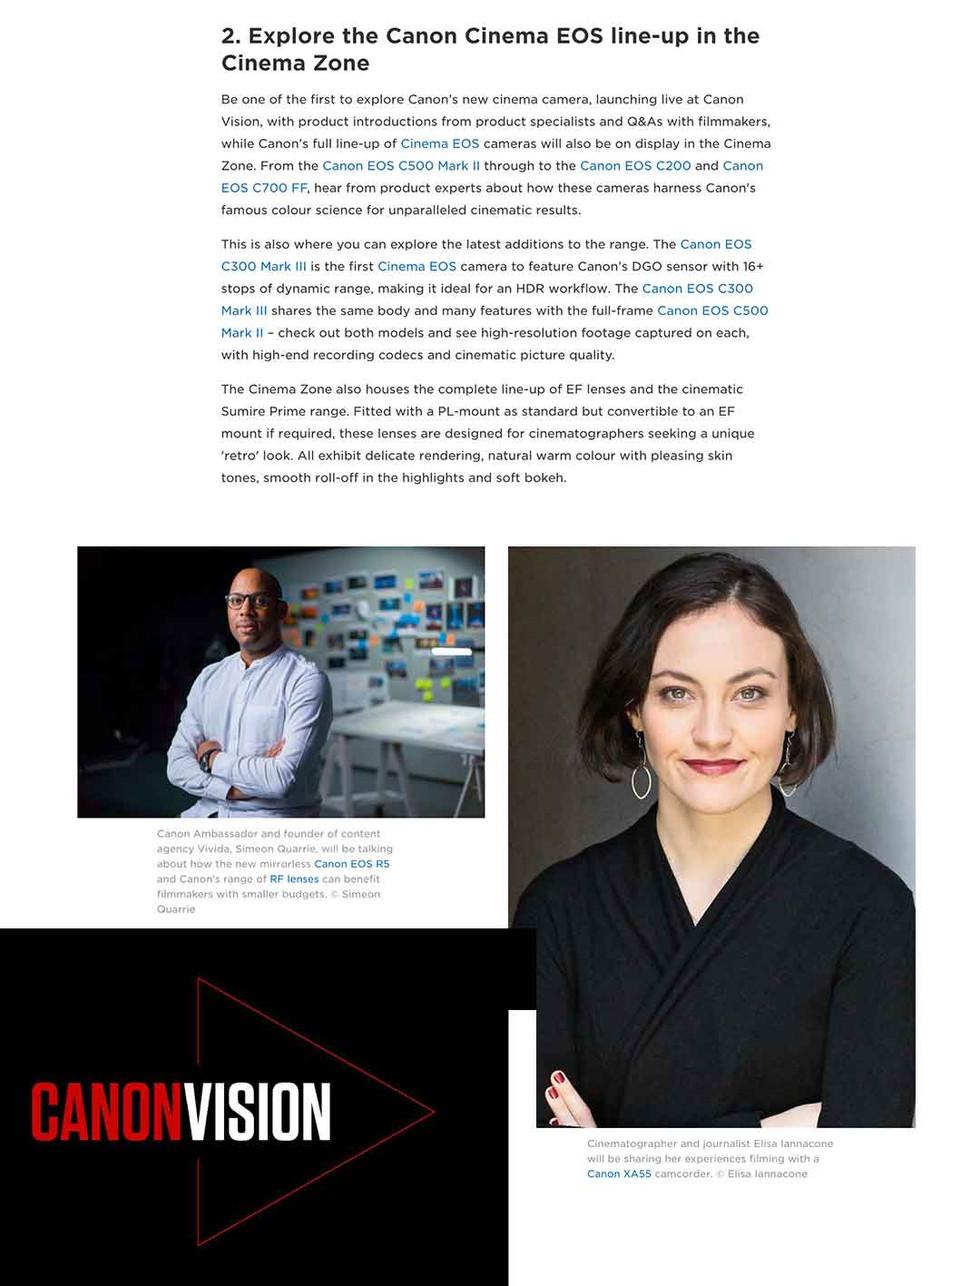 Canon Vision Cinema EOS Launch